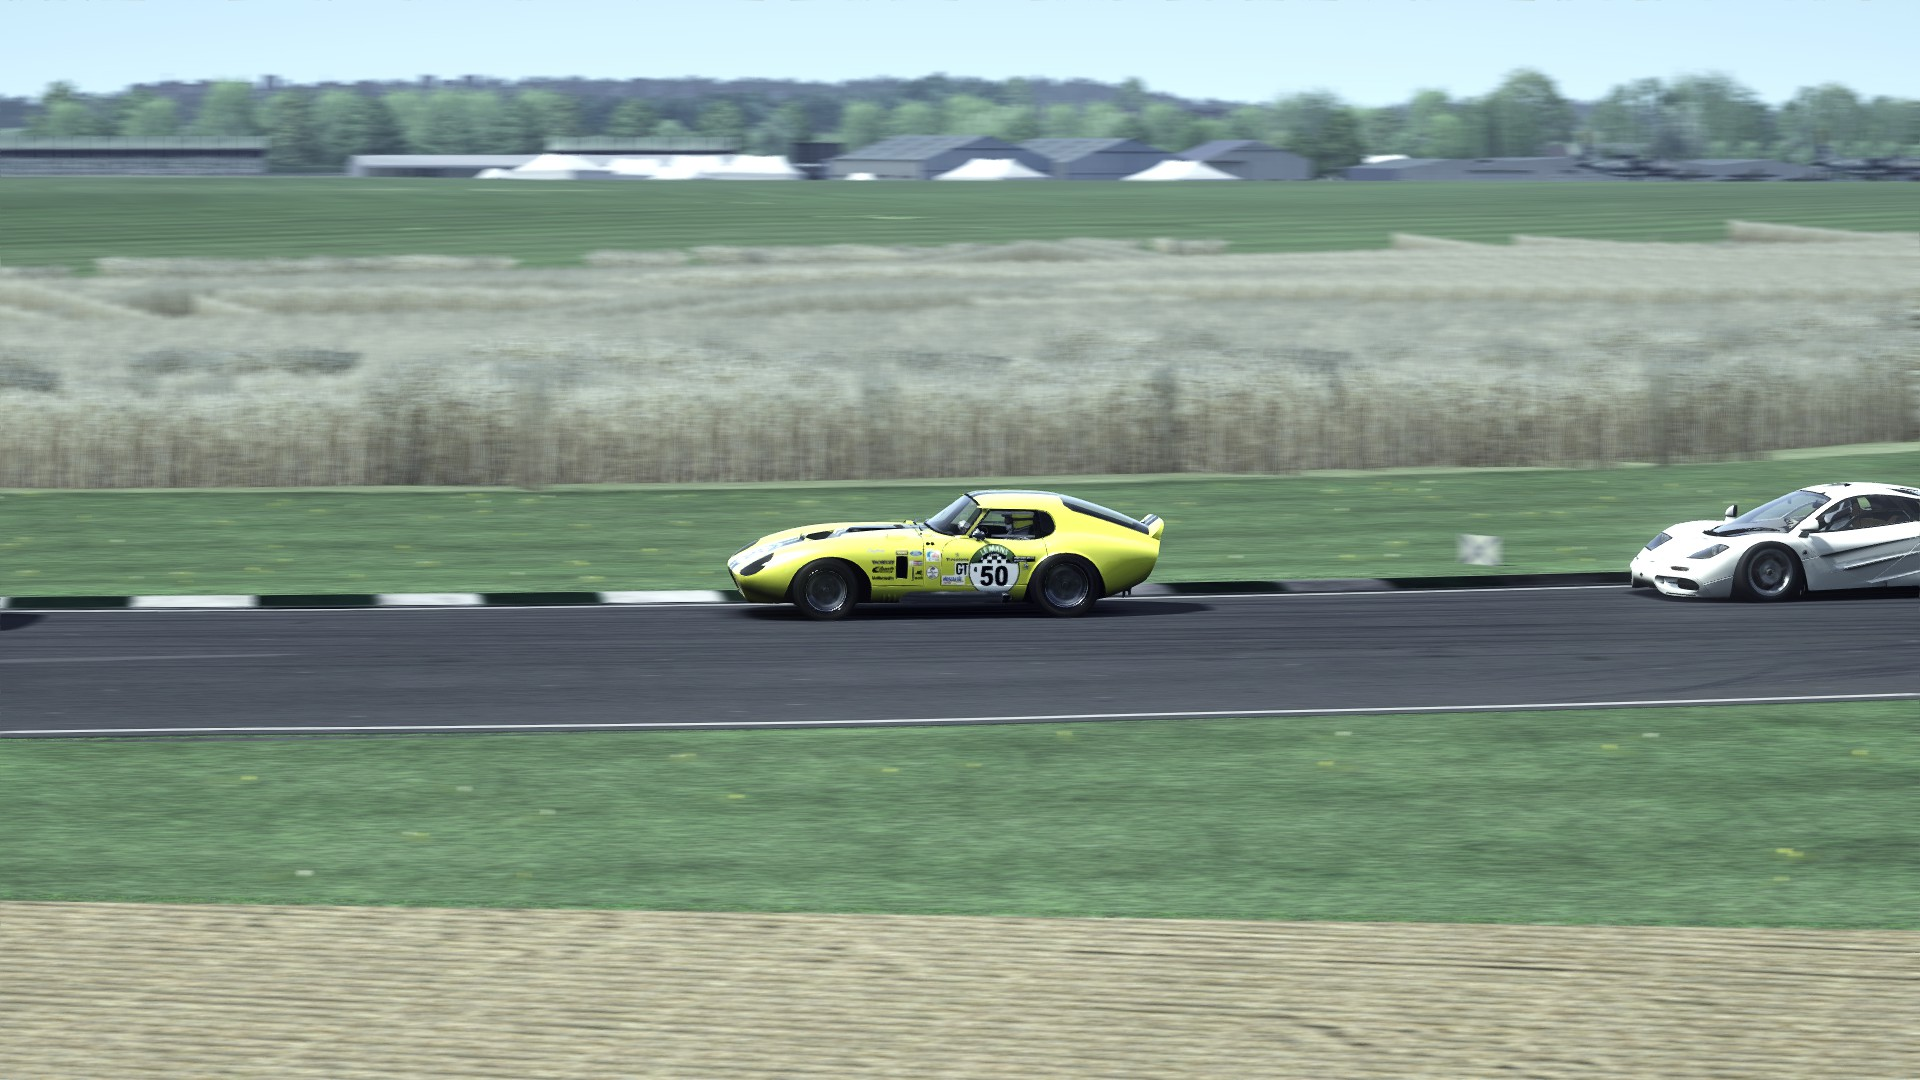 Shelby Daytona Coupe at Goodwood 1.16.x 080_032018.jpg